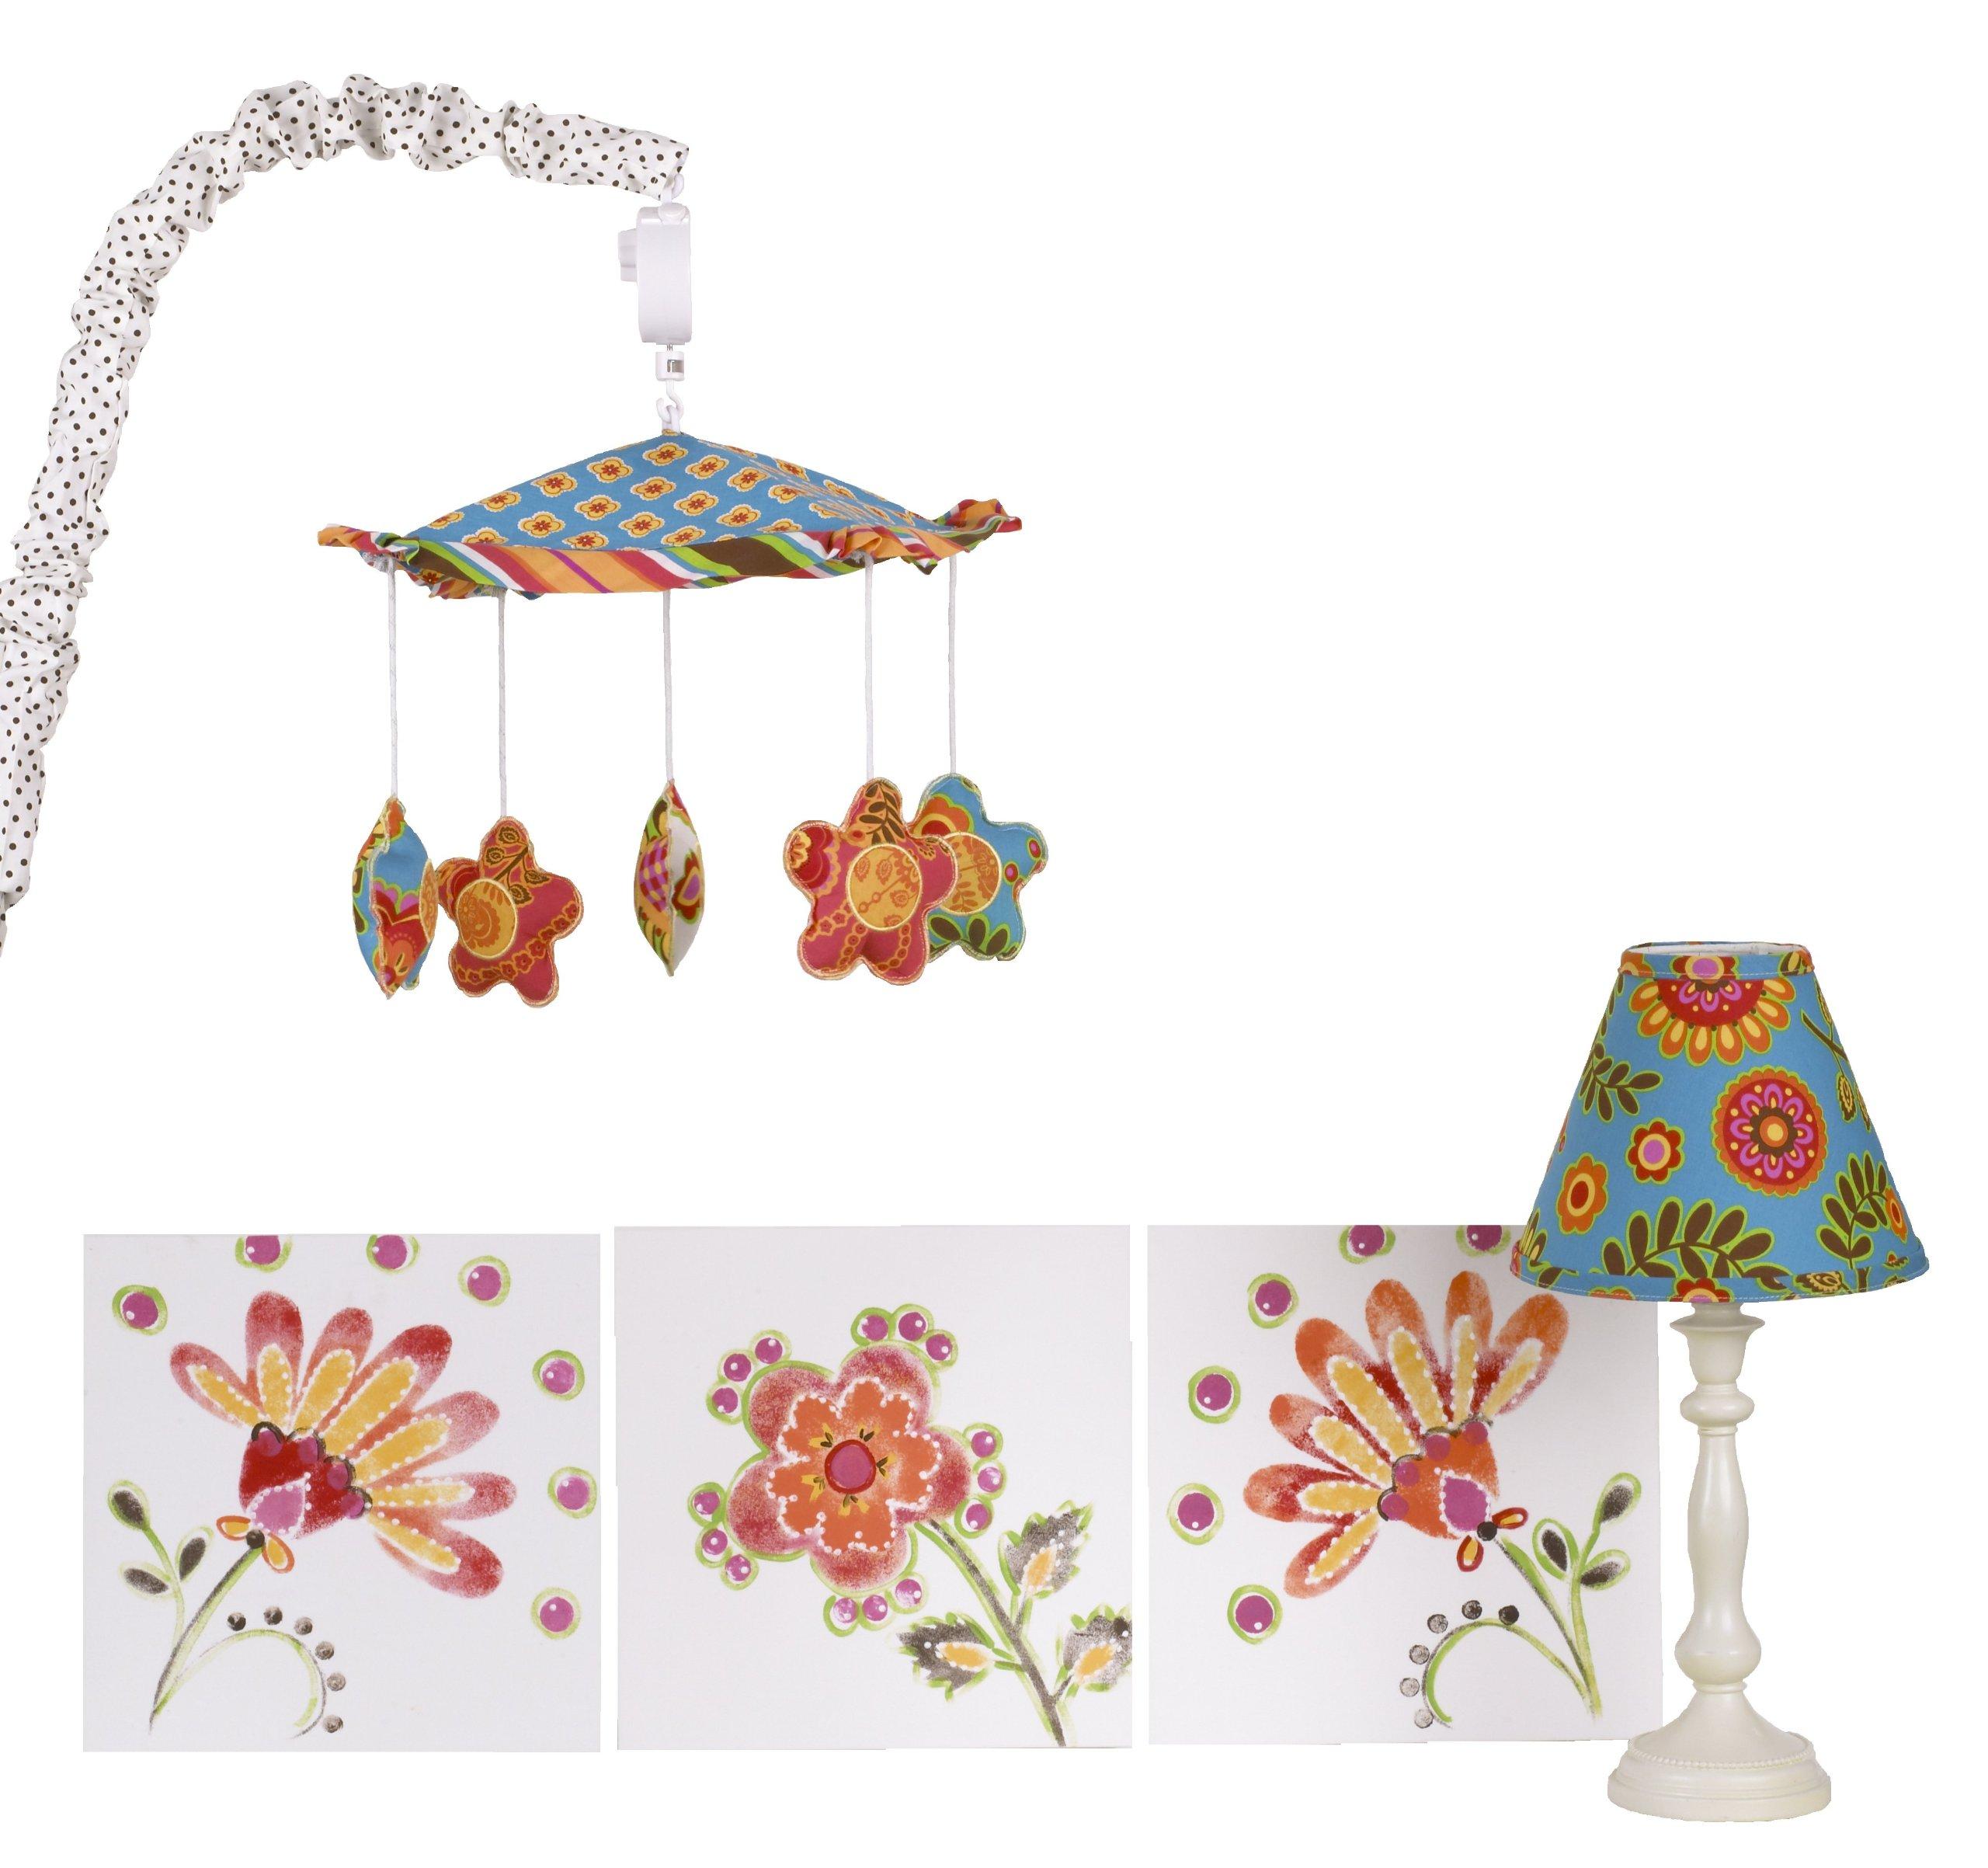 Cotton Tale Designs Decor Kit, Gypsy by Cotton Tale Designs